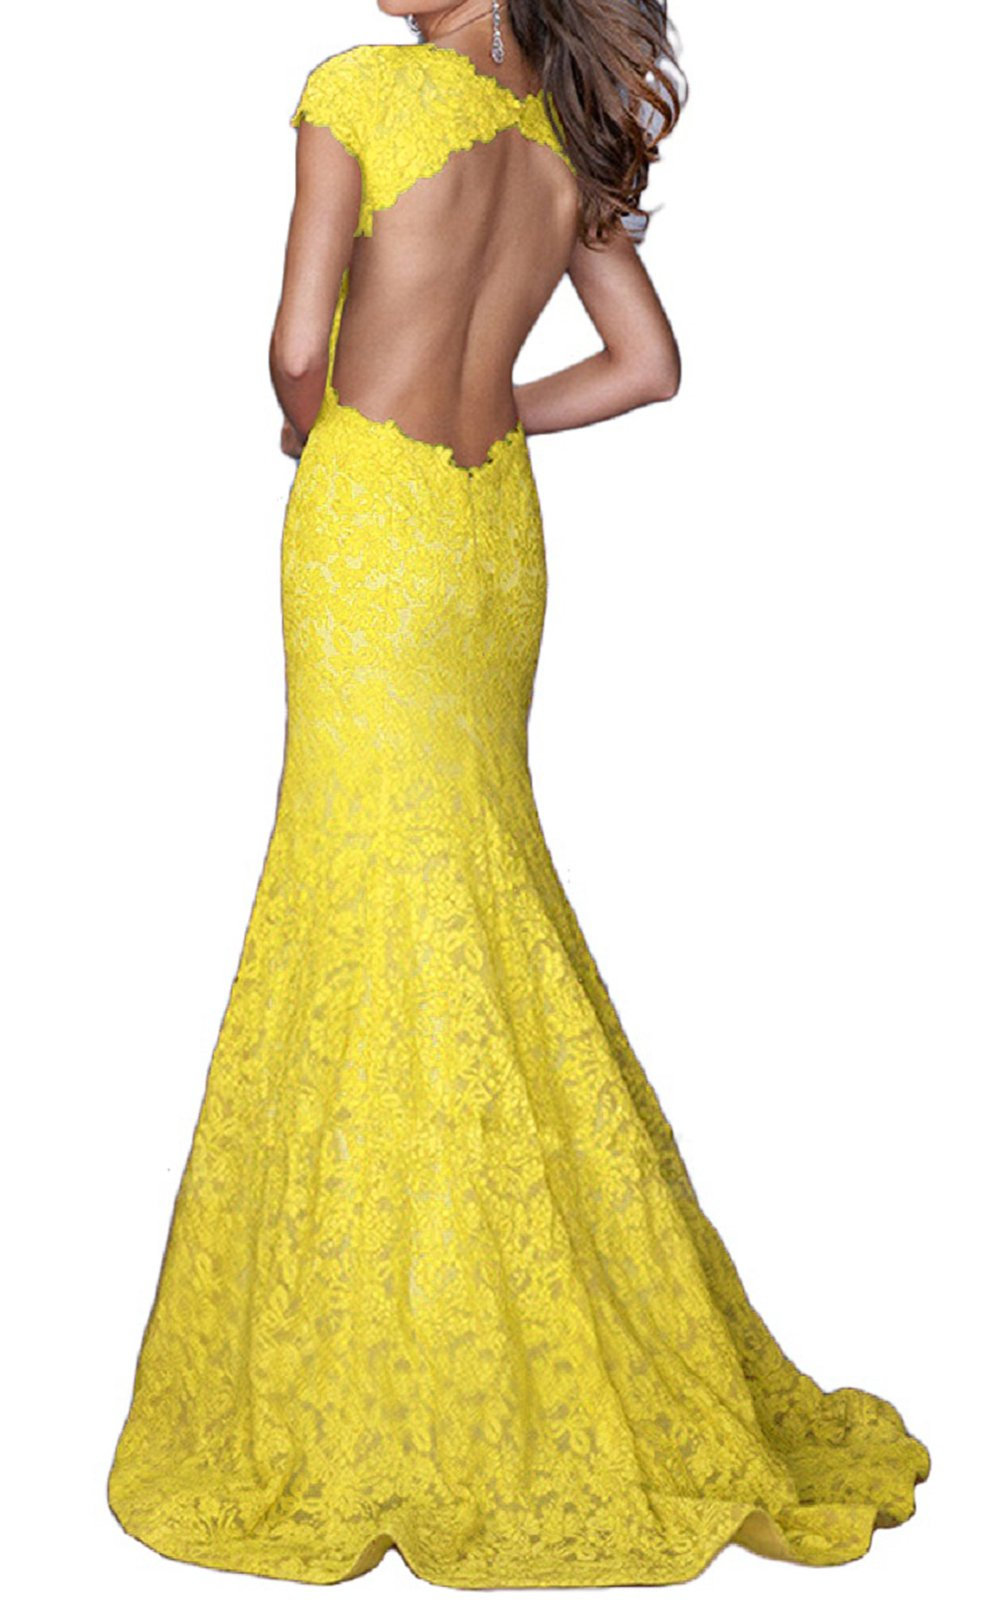 FELALA Women's Backless Mermaid Lace Long Evening Prom Dresses Yellow 2